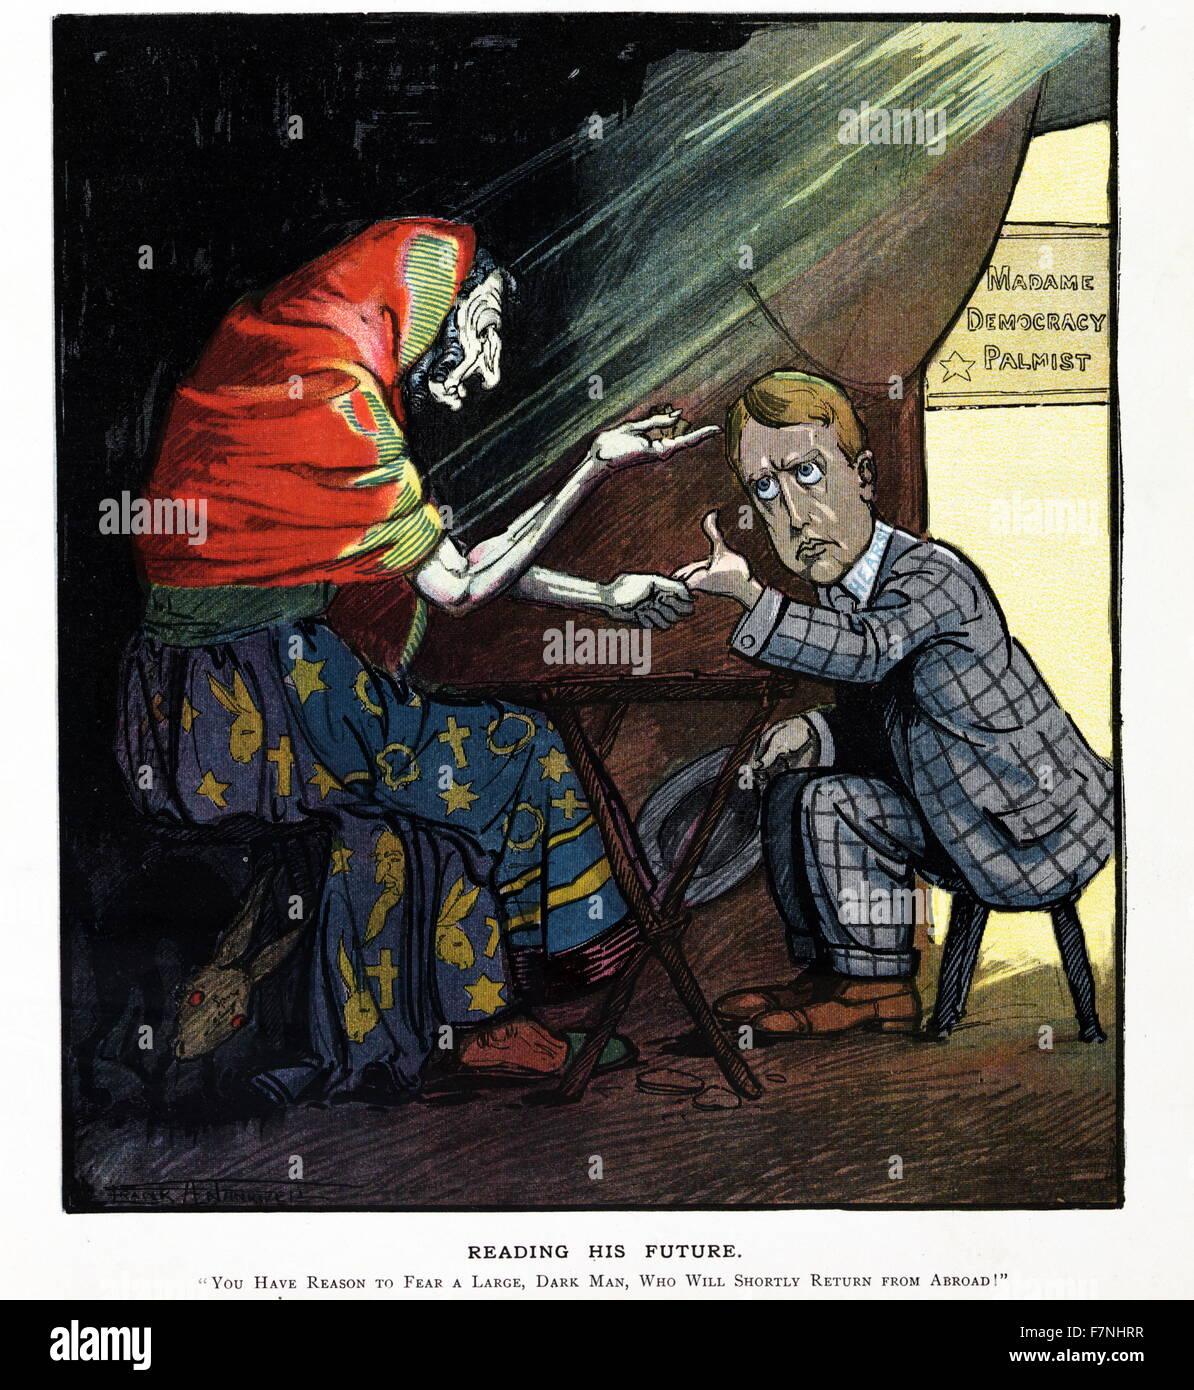 Political Satire Illustration Depicting Madame Democracy Palmist